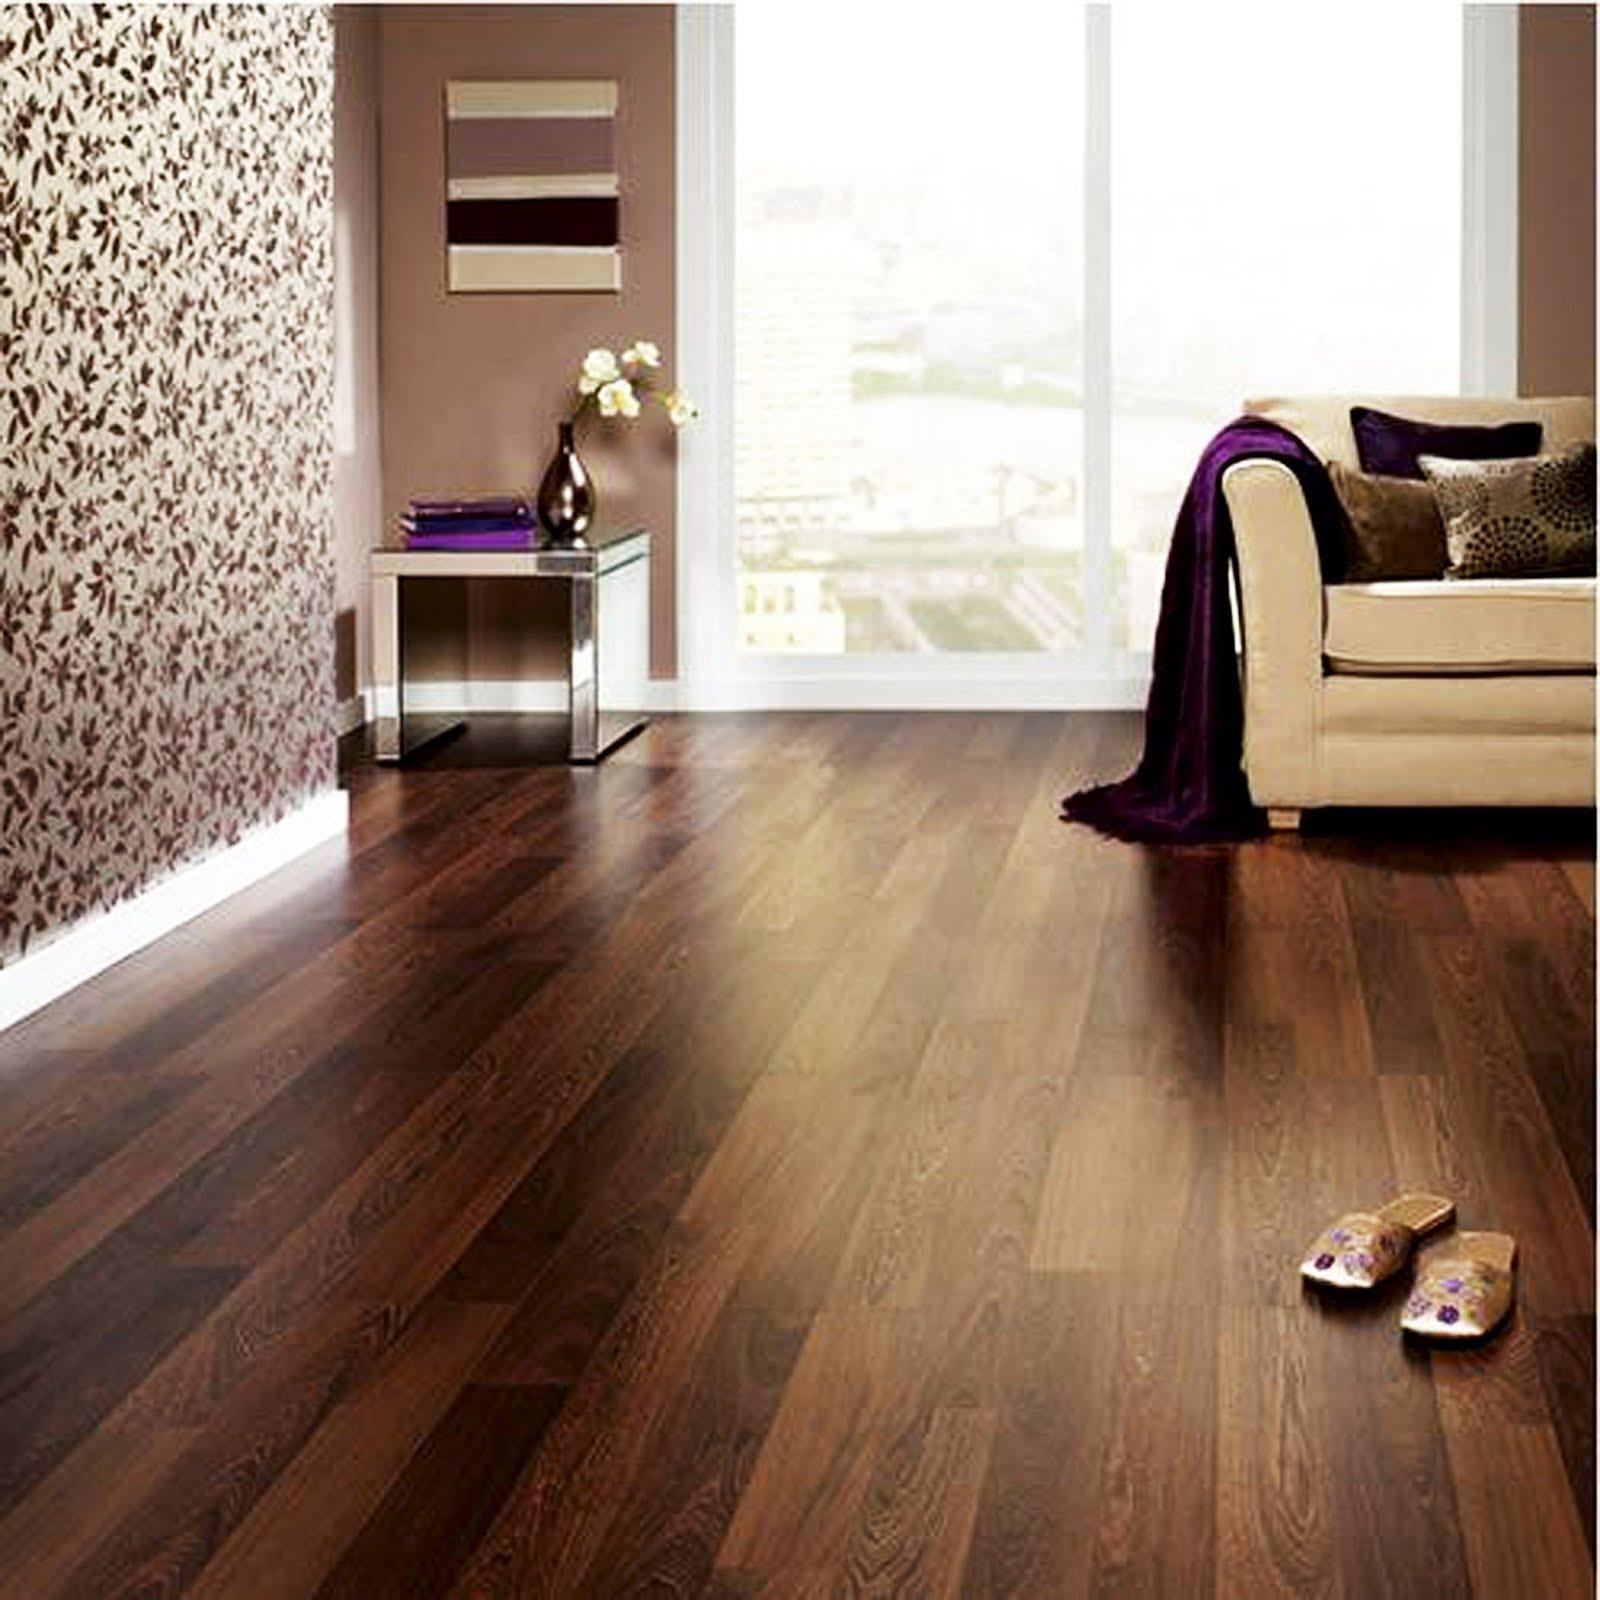 What Is Wooden Flooring: Interior Decorating Idea